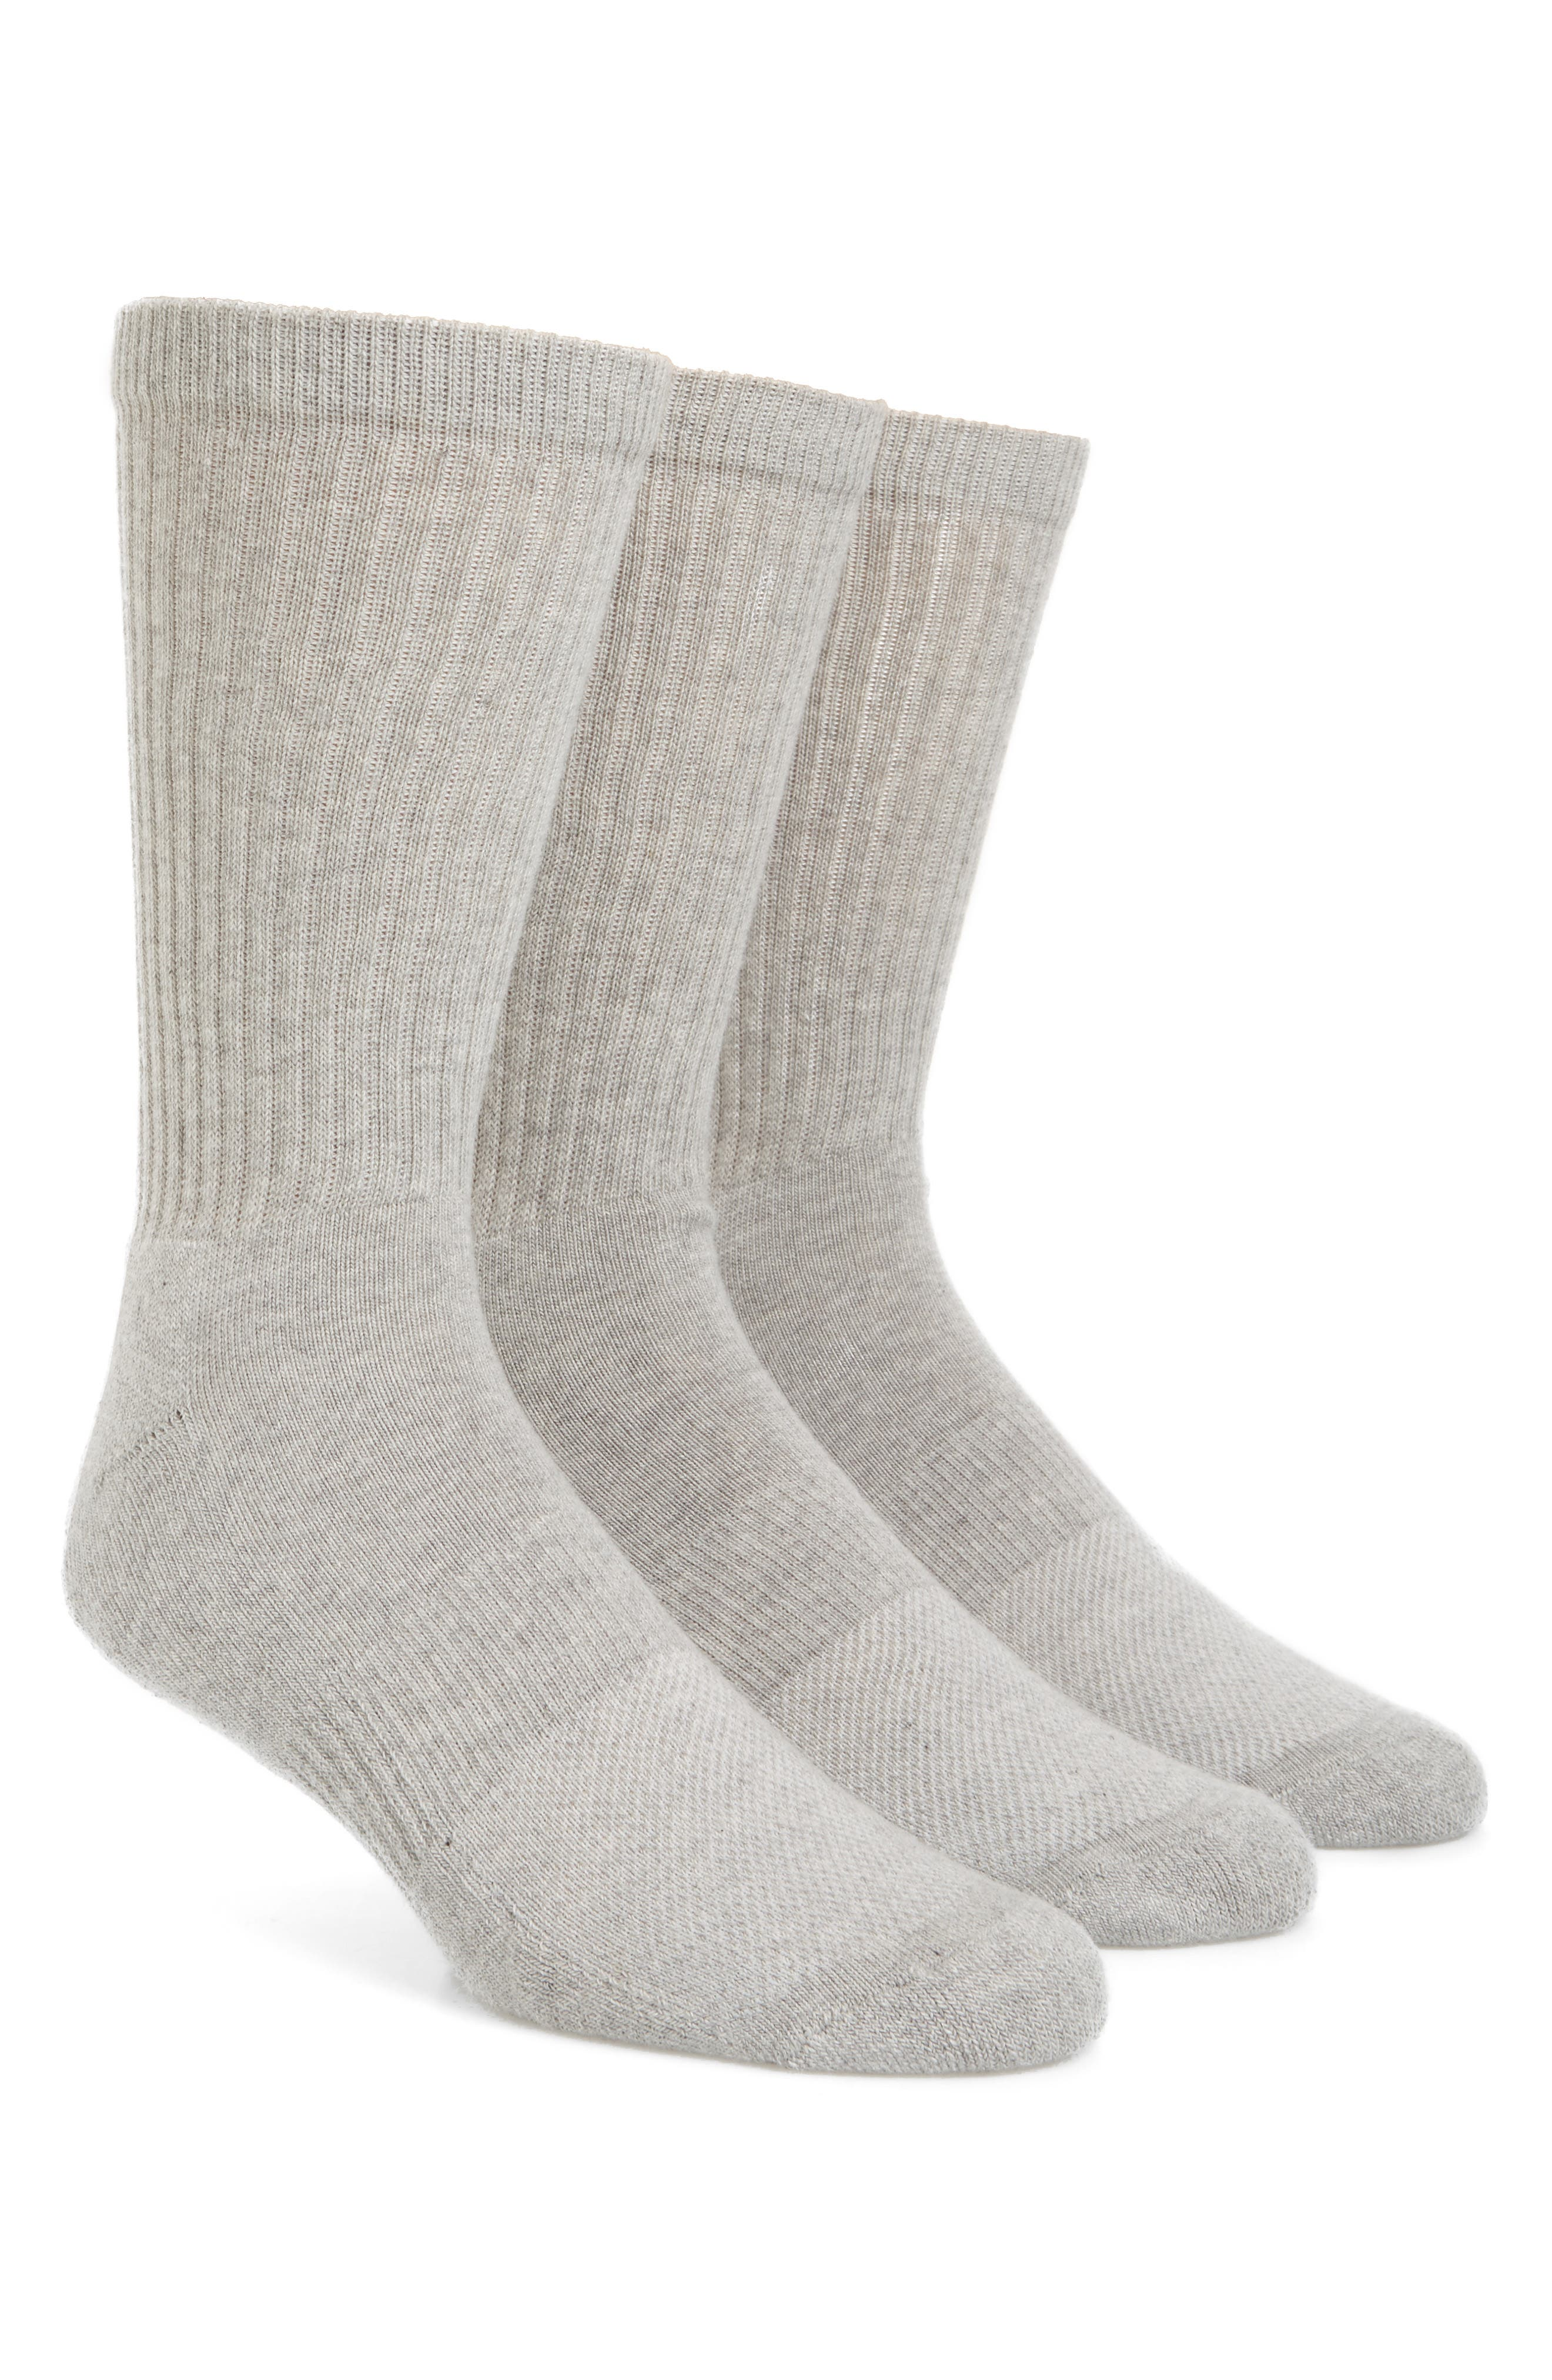 Alternate Image 1 Selected - Nordstrom Men's Shop 3-Pack Crew Cut Athletic Socks (King Size)